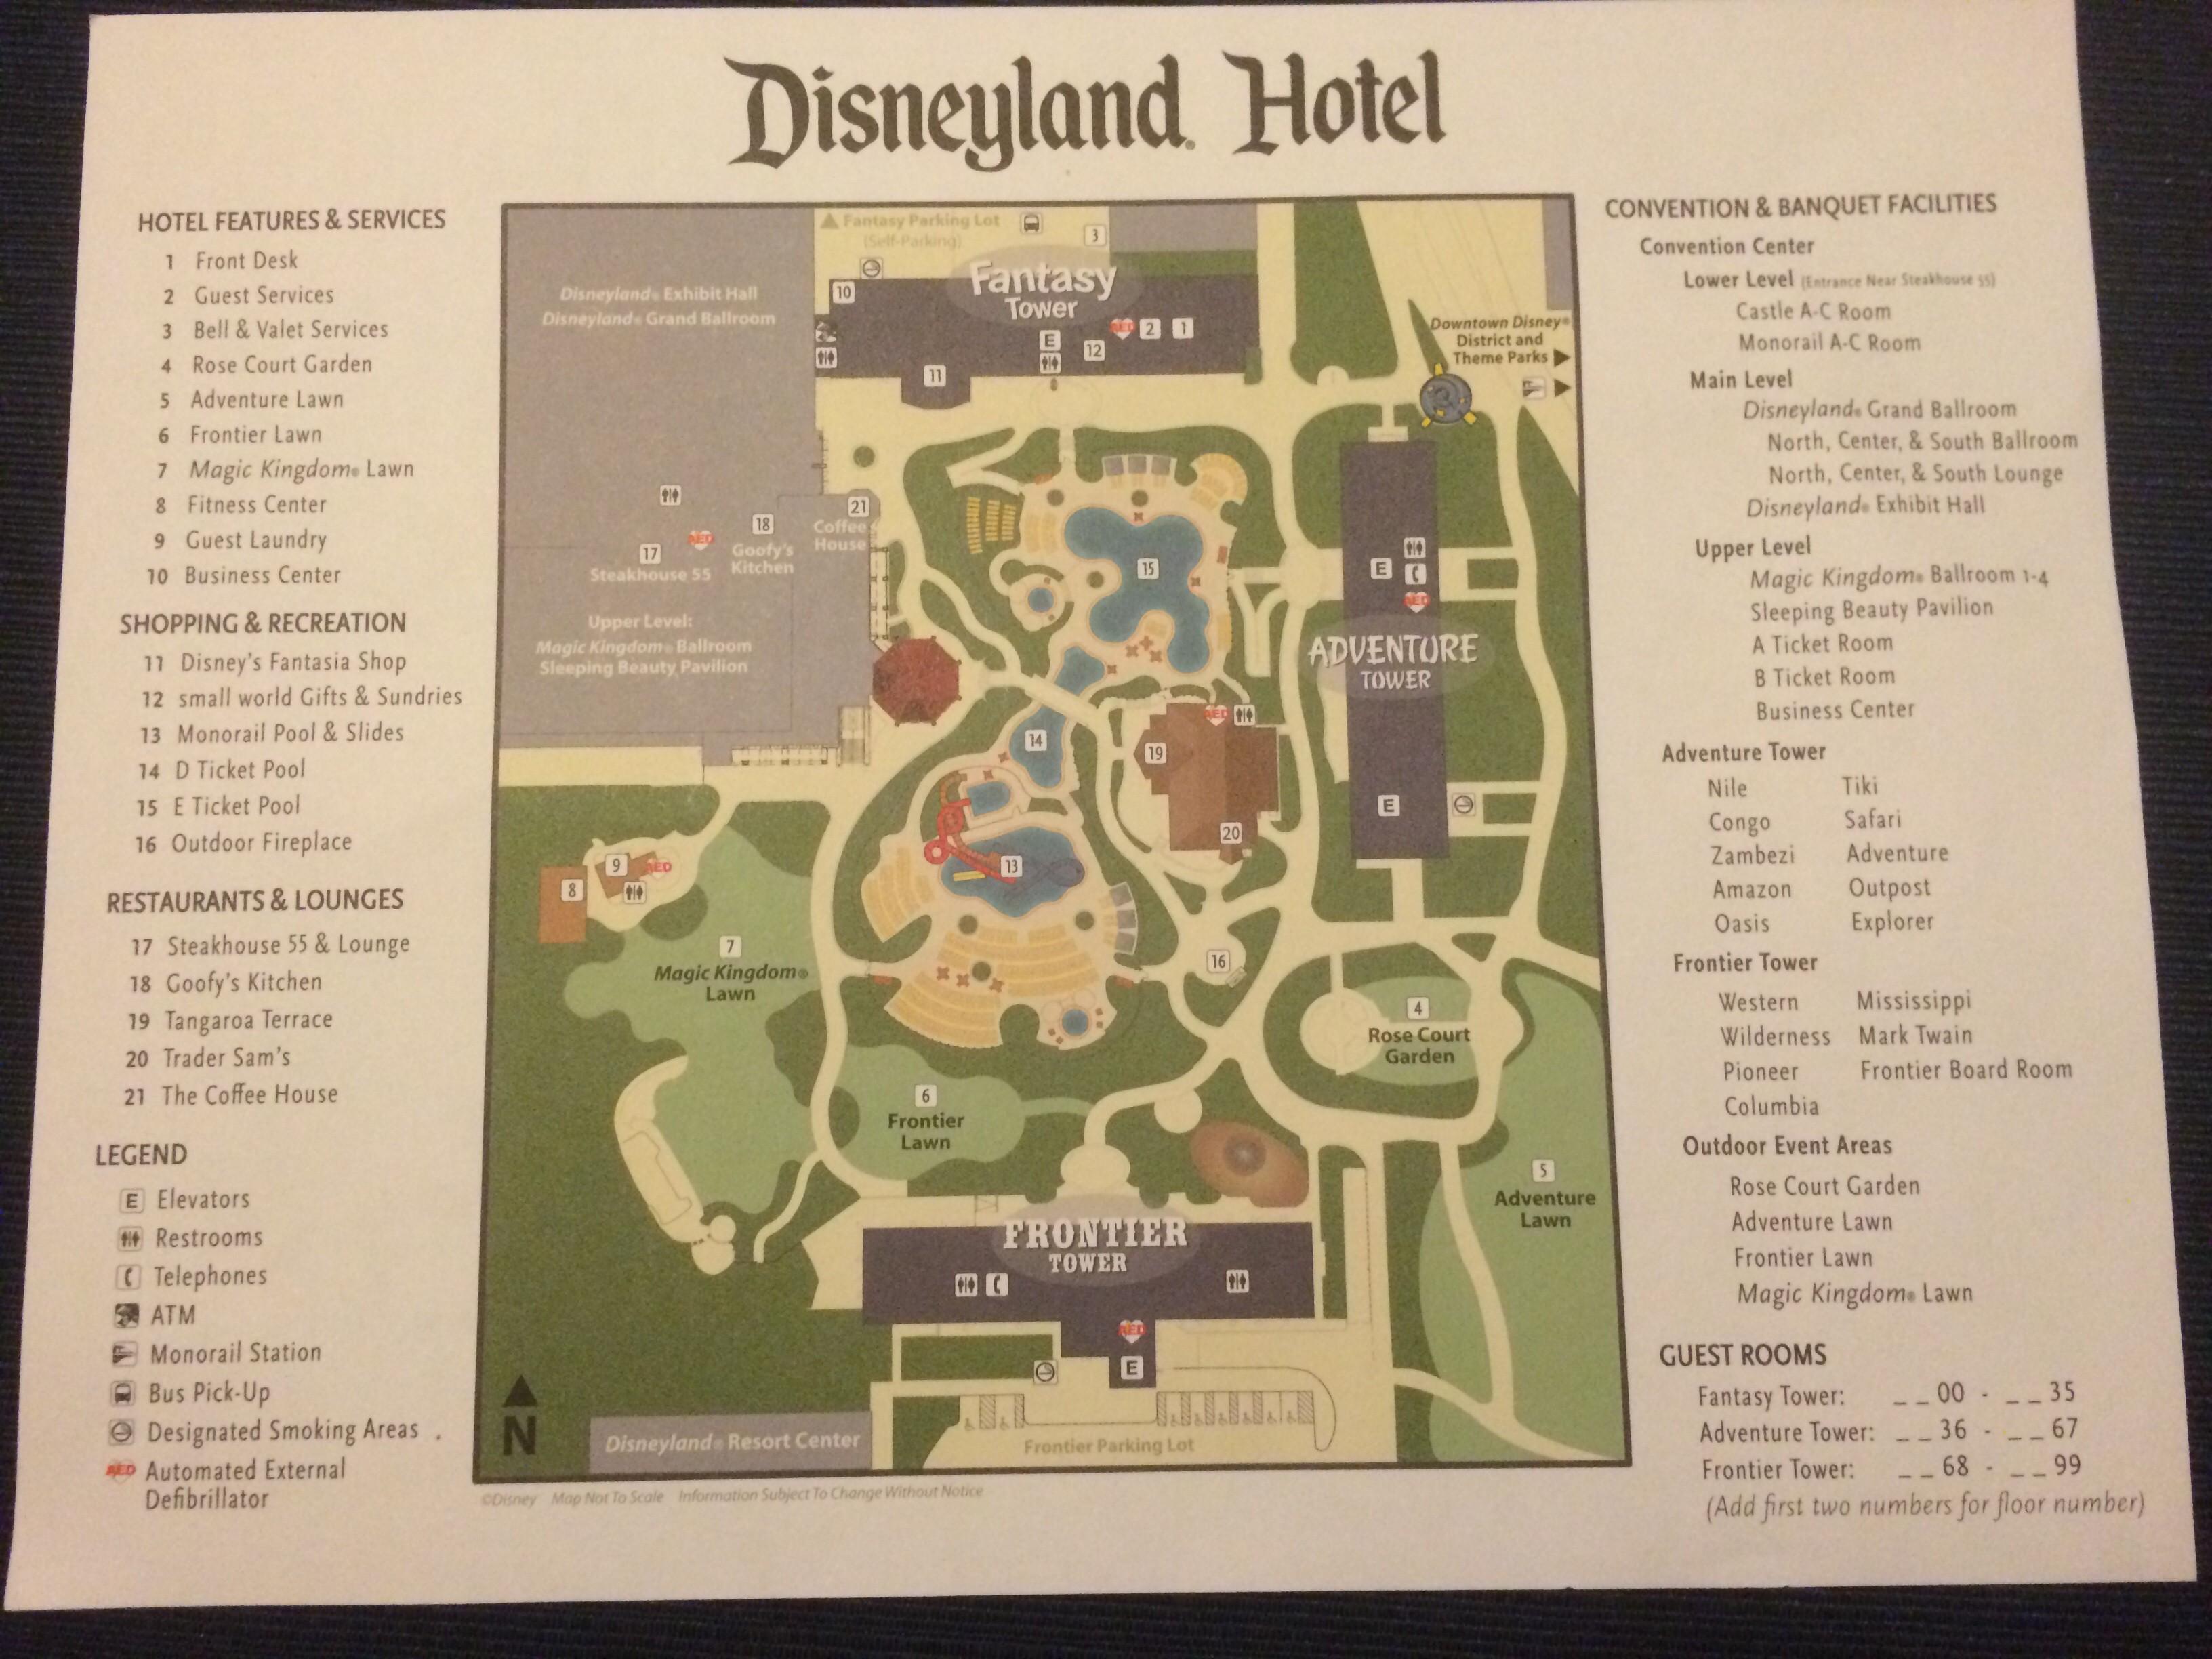 Staying at the Disneyl...